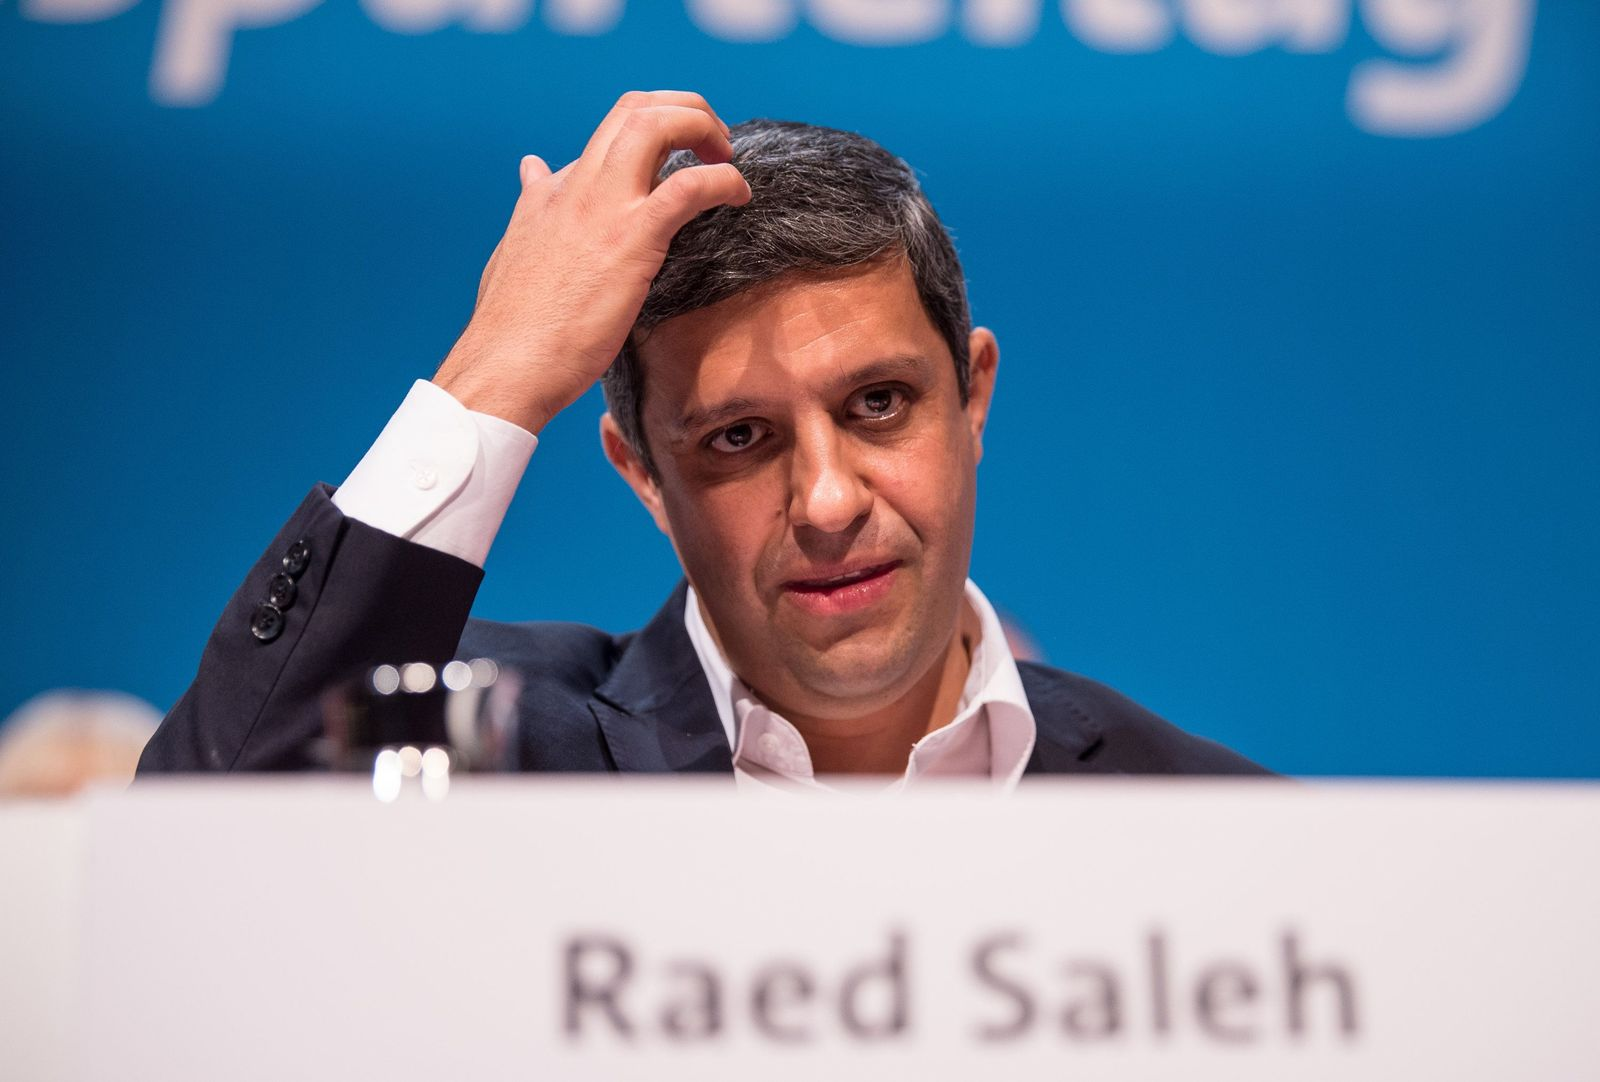 Raed Saleh SPD Berlin